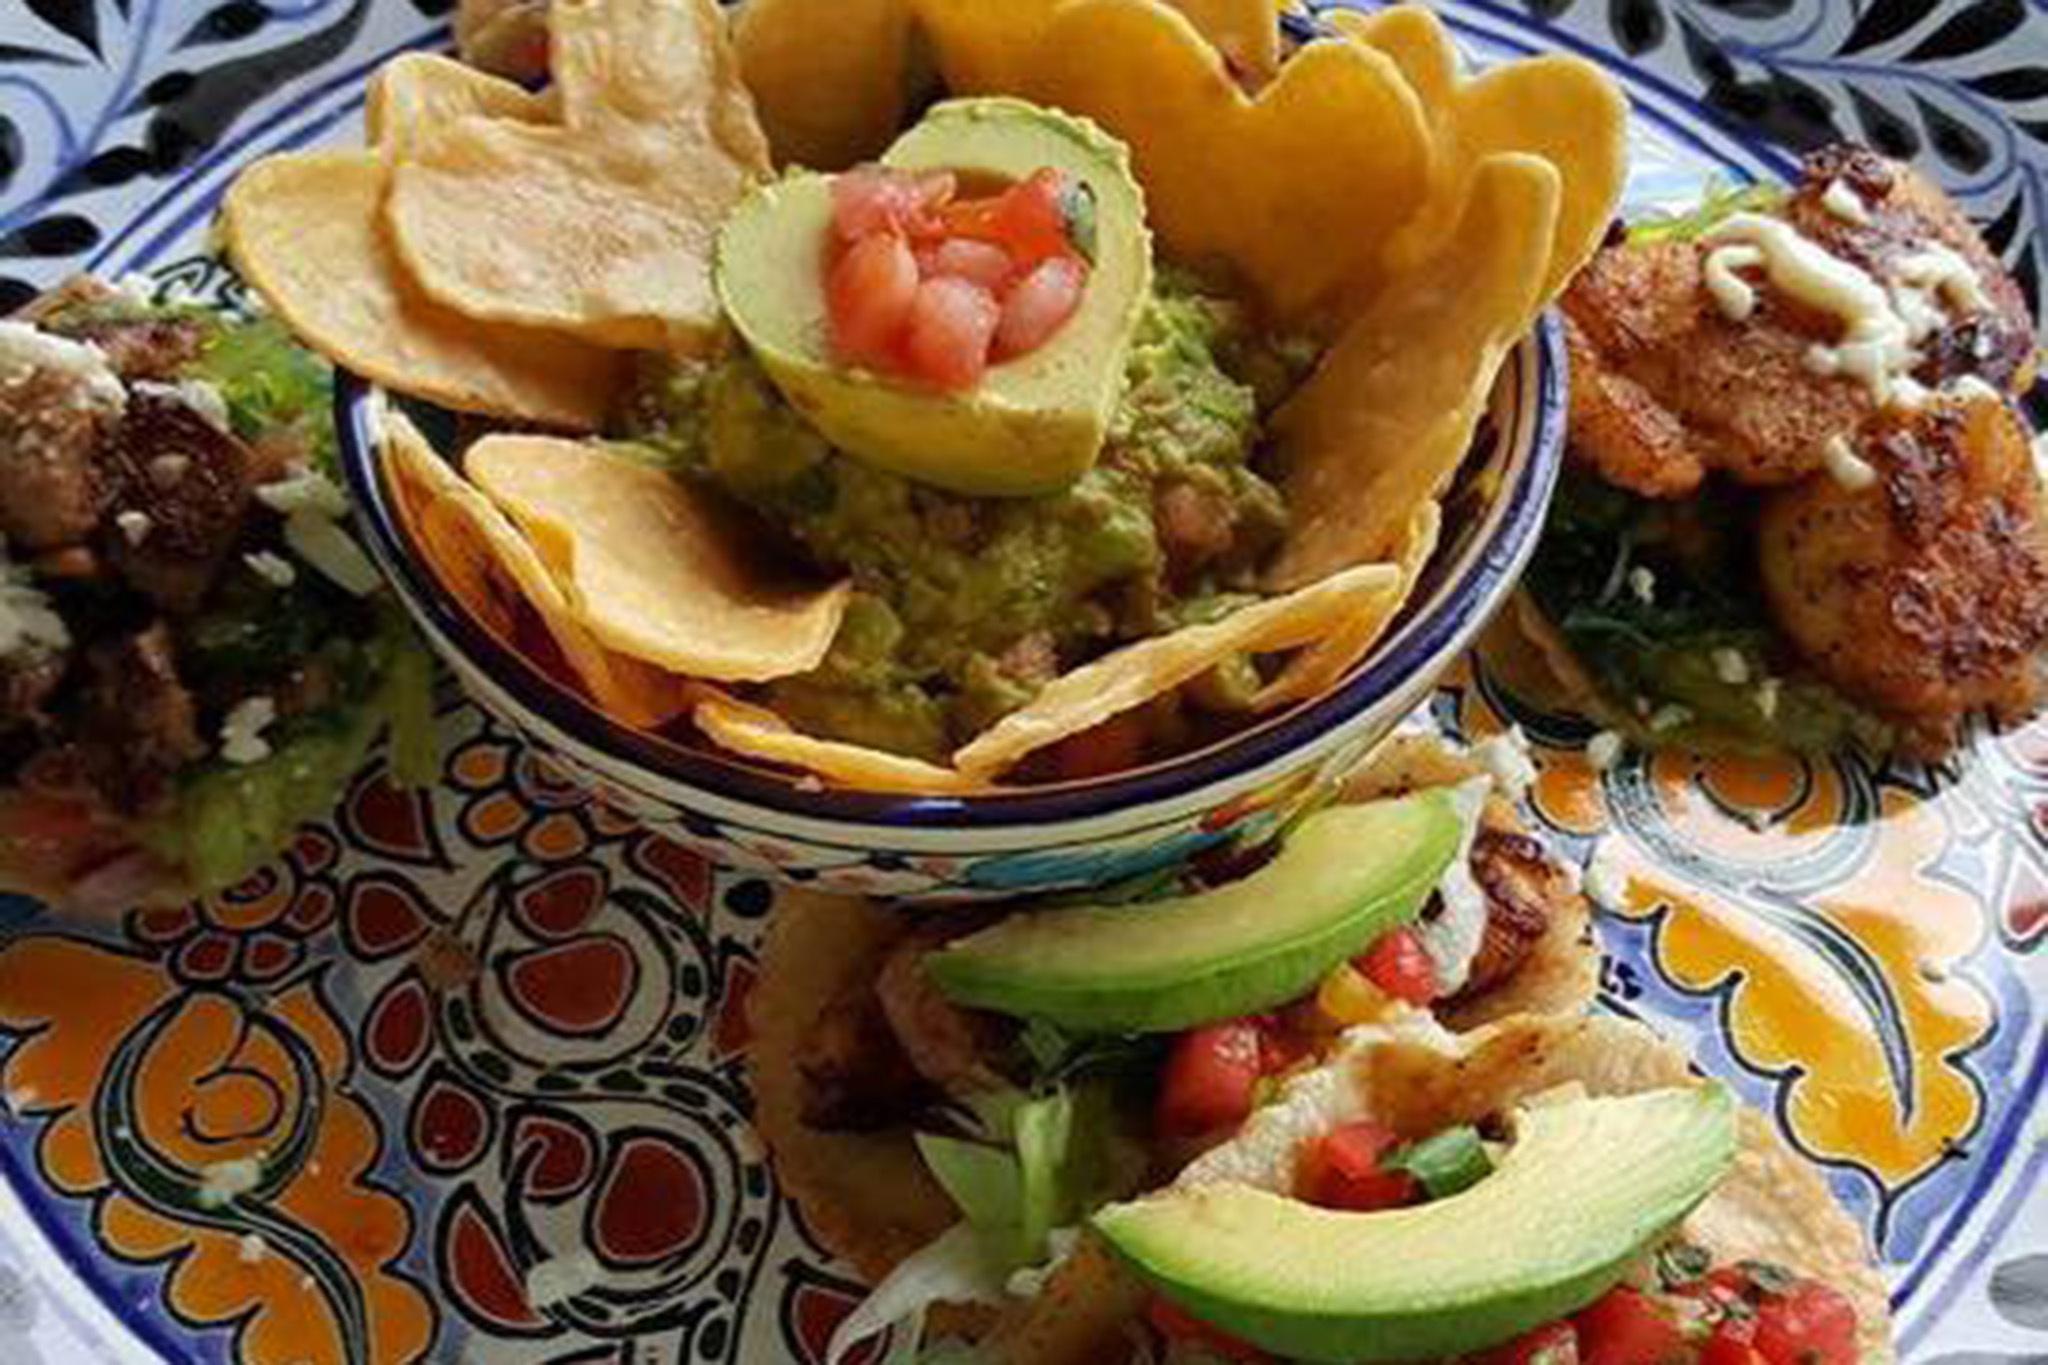 Eduardo's Taco Stand, eitw